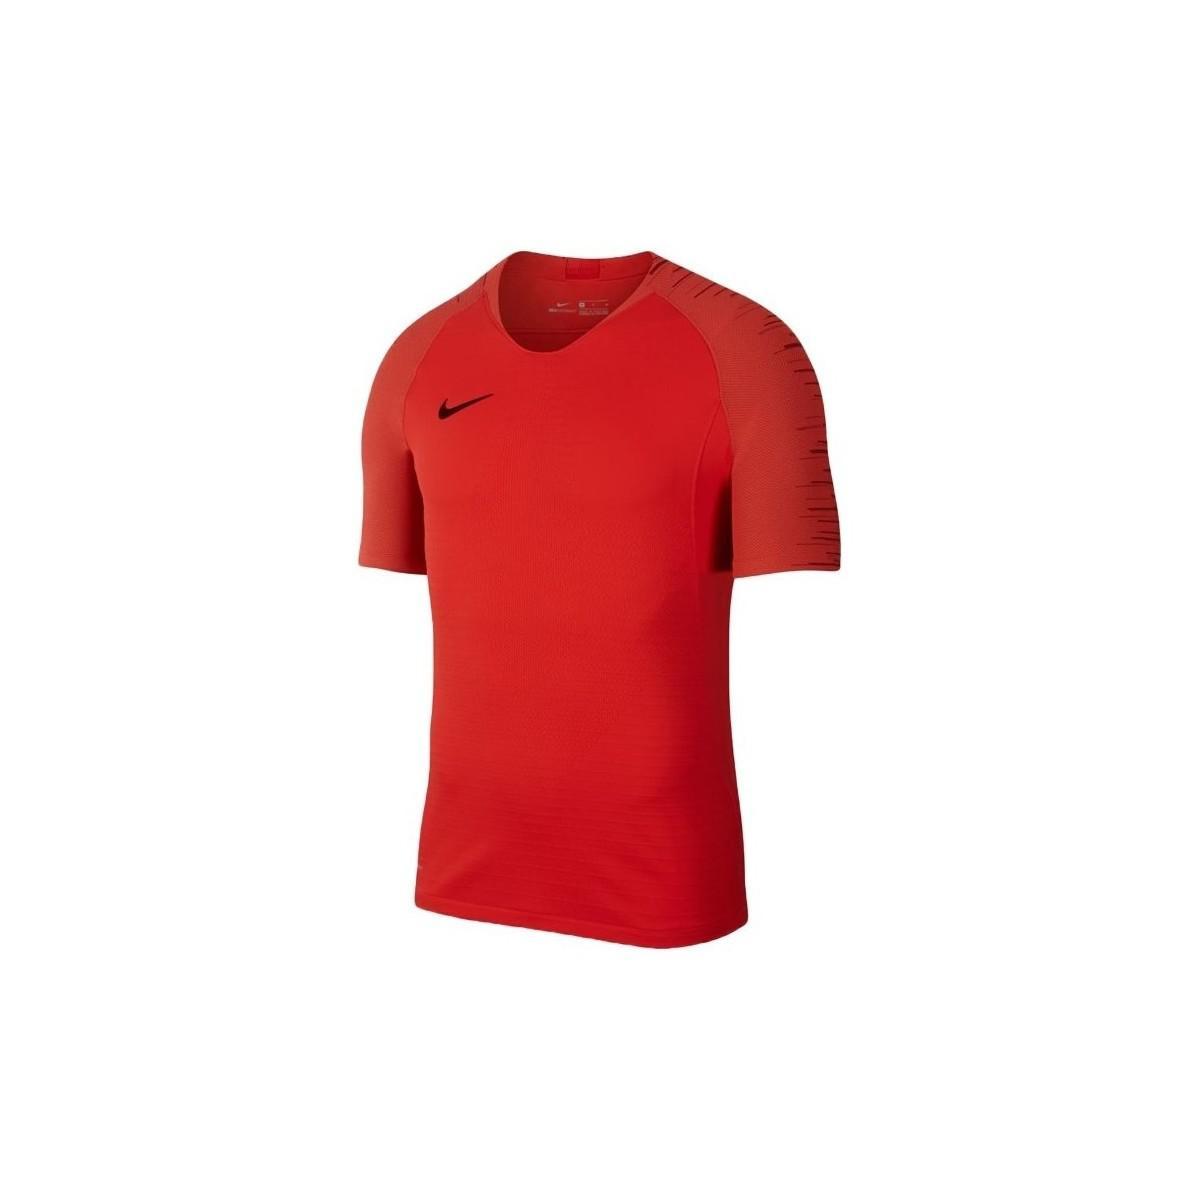 75801d7d Nike Vaporknit Strike Top Ss Men's T Shirt In Red in Red for Men - Lyst